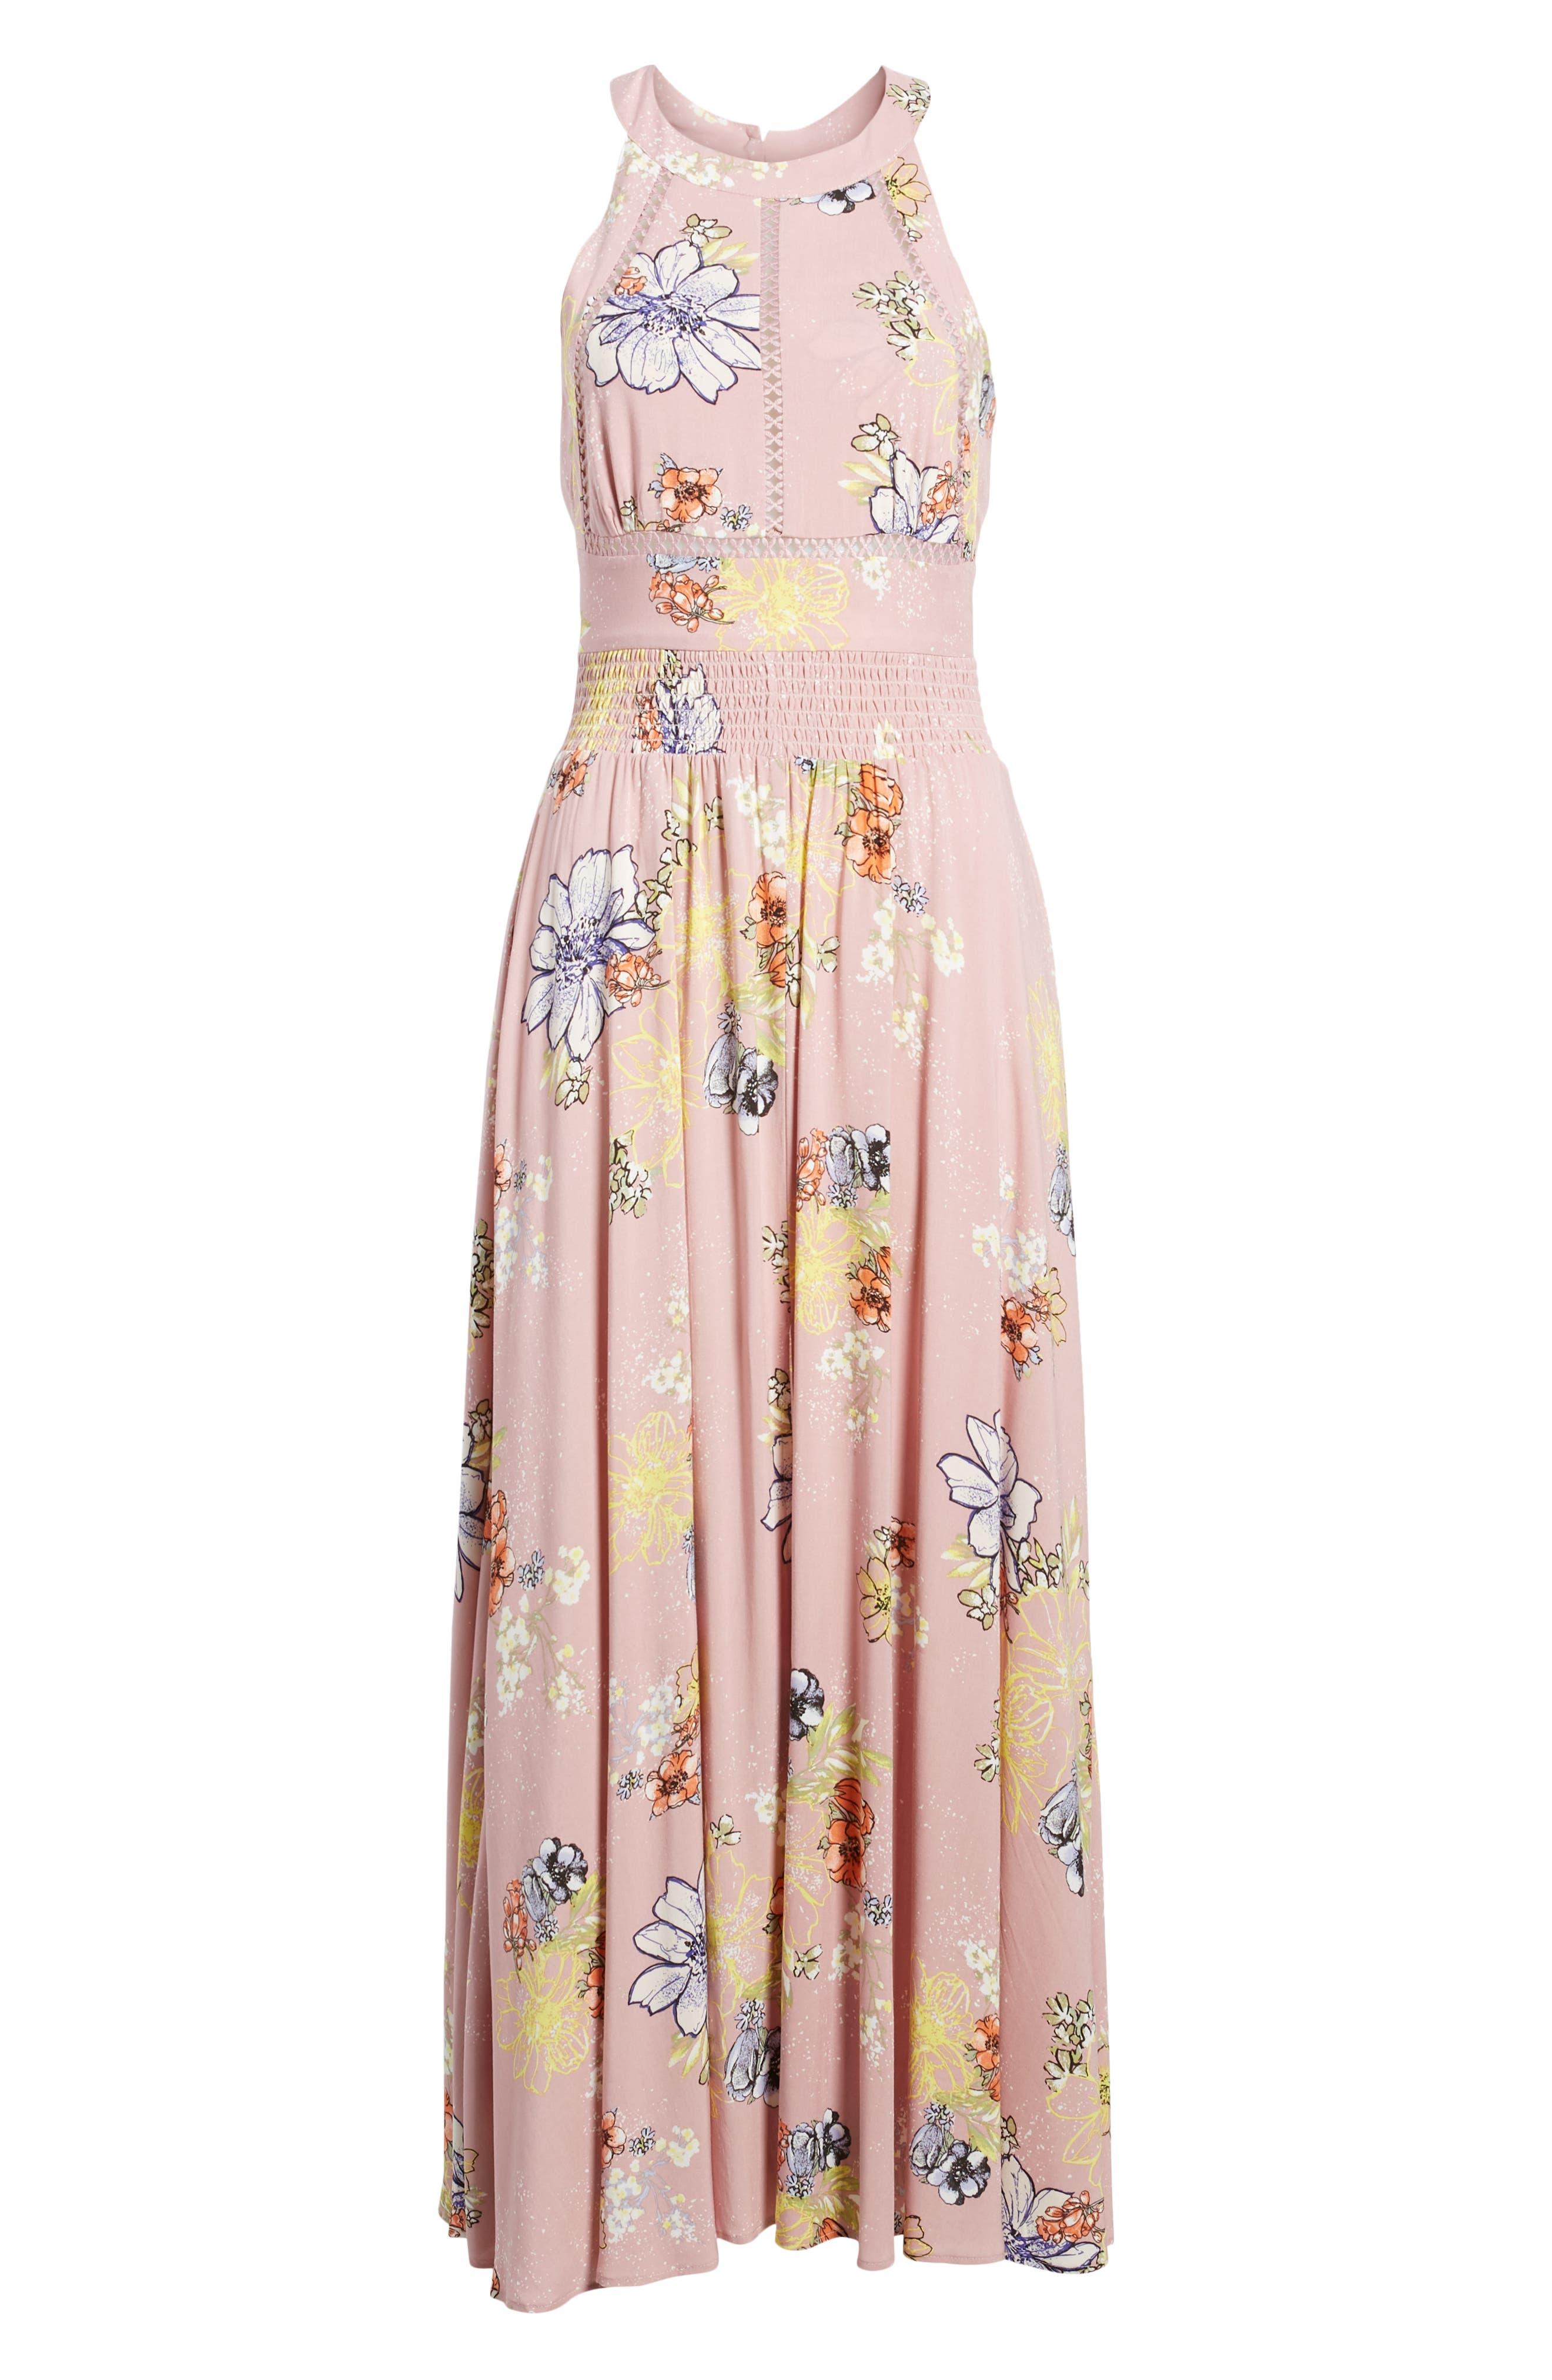 Floral Print Halter Maxi Dress,                             Alternate thumbnail 7, color,                             PINK EGRET ABSTRACT FLORAL